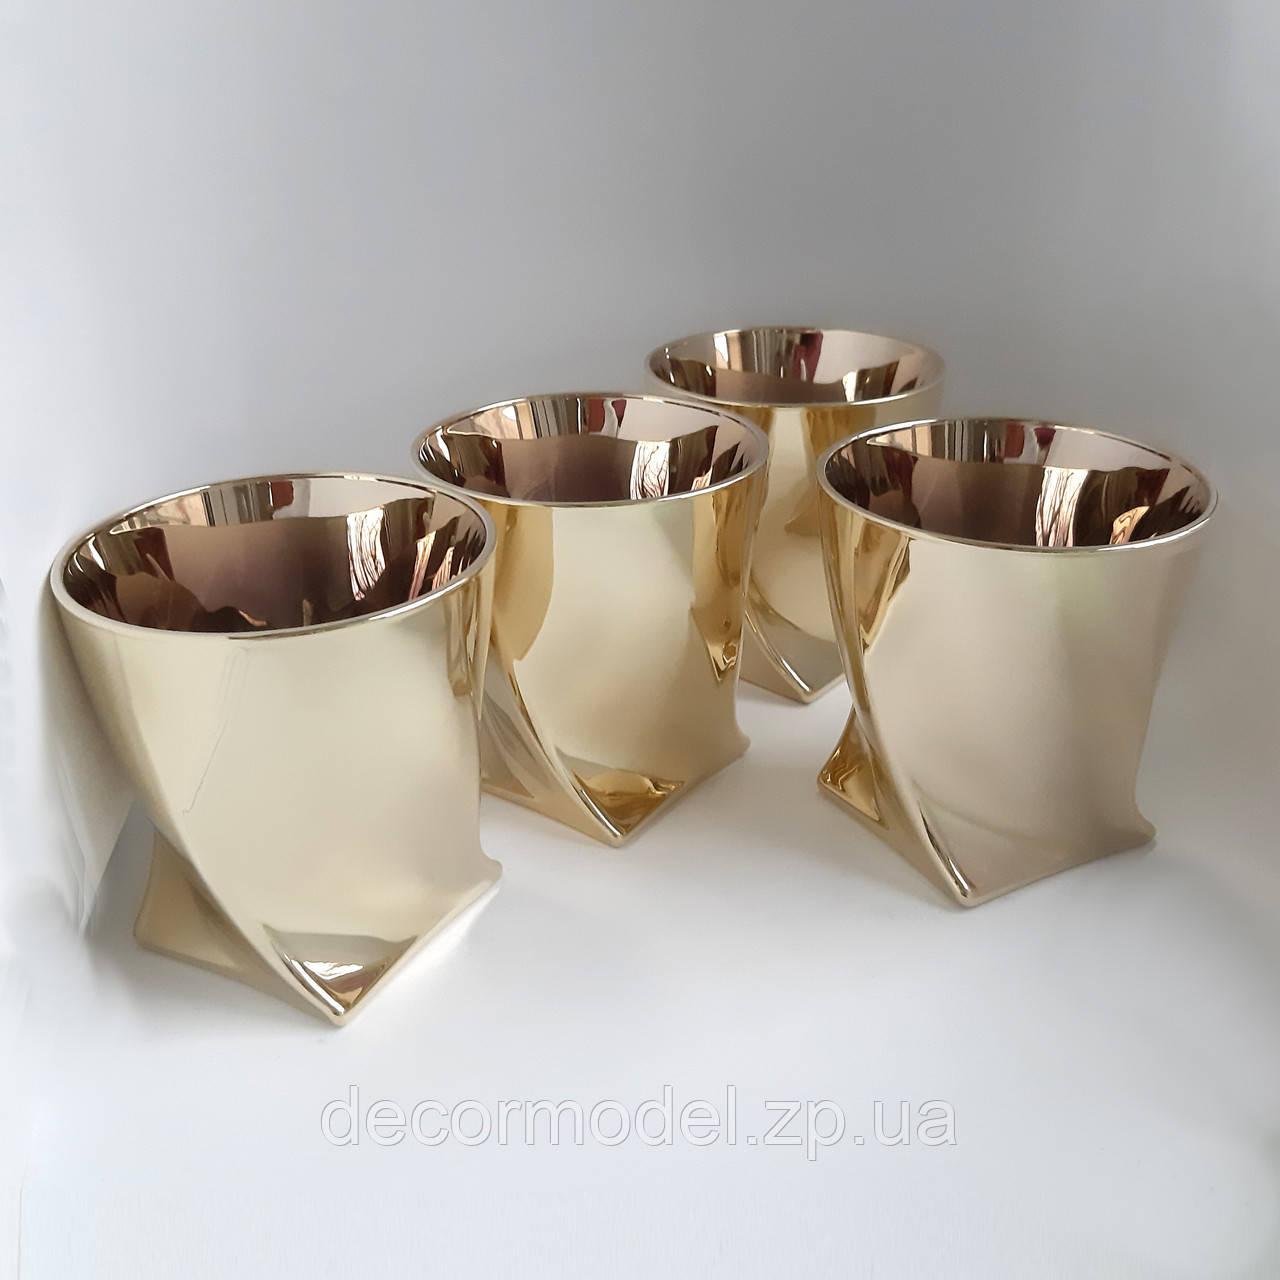 Набор стаканов для виски 6 шт Bohemia Quadro 340 мл золото